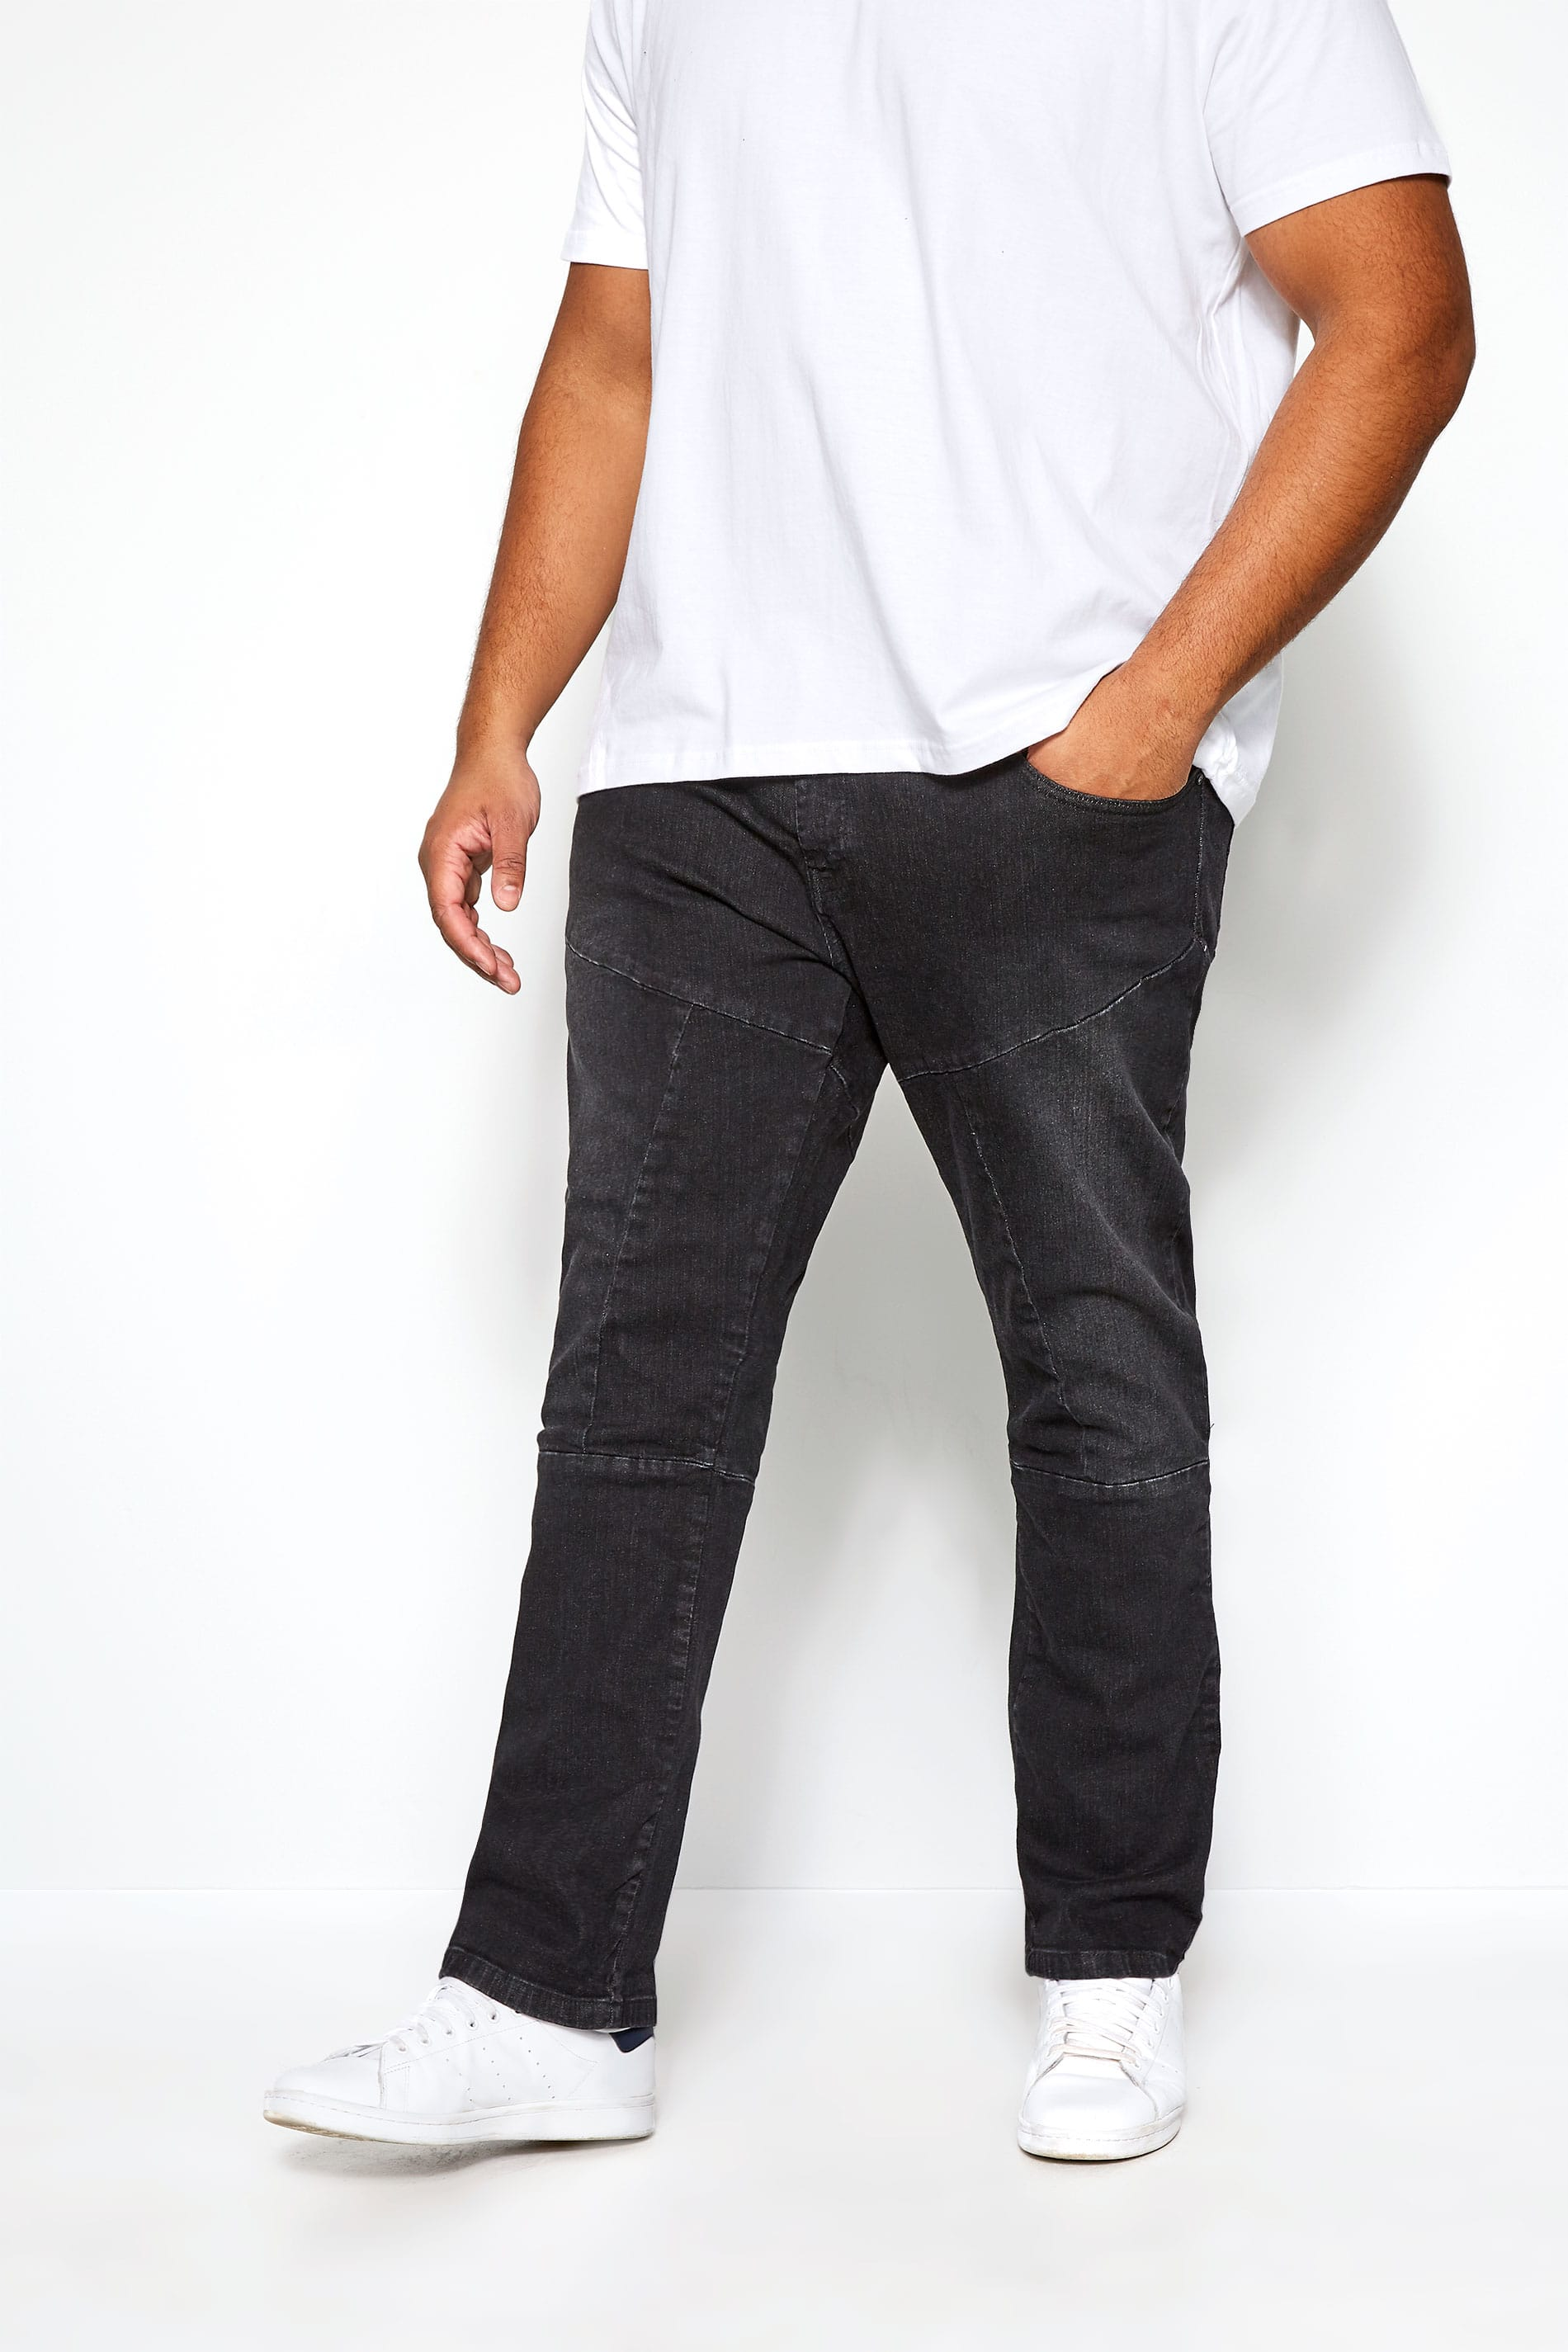 RAWCRAFT Blackwash Straight Leg Jeans